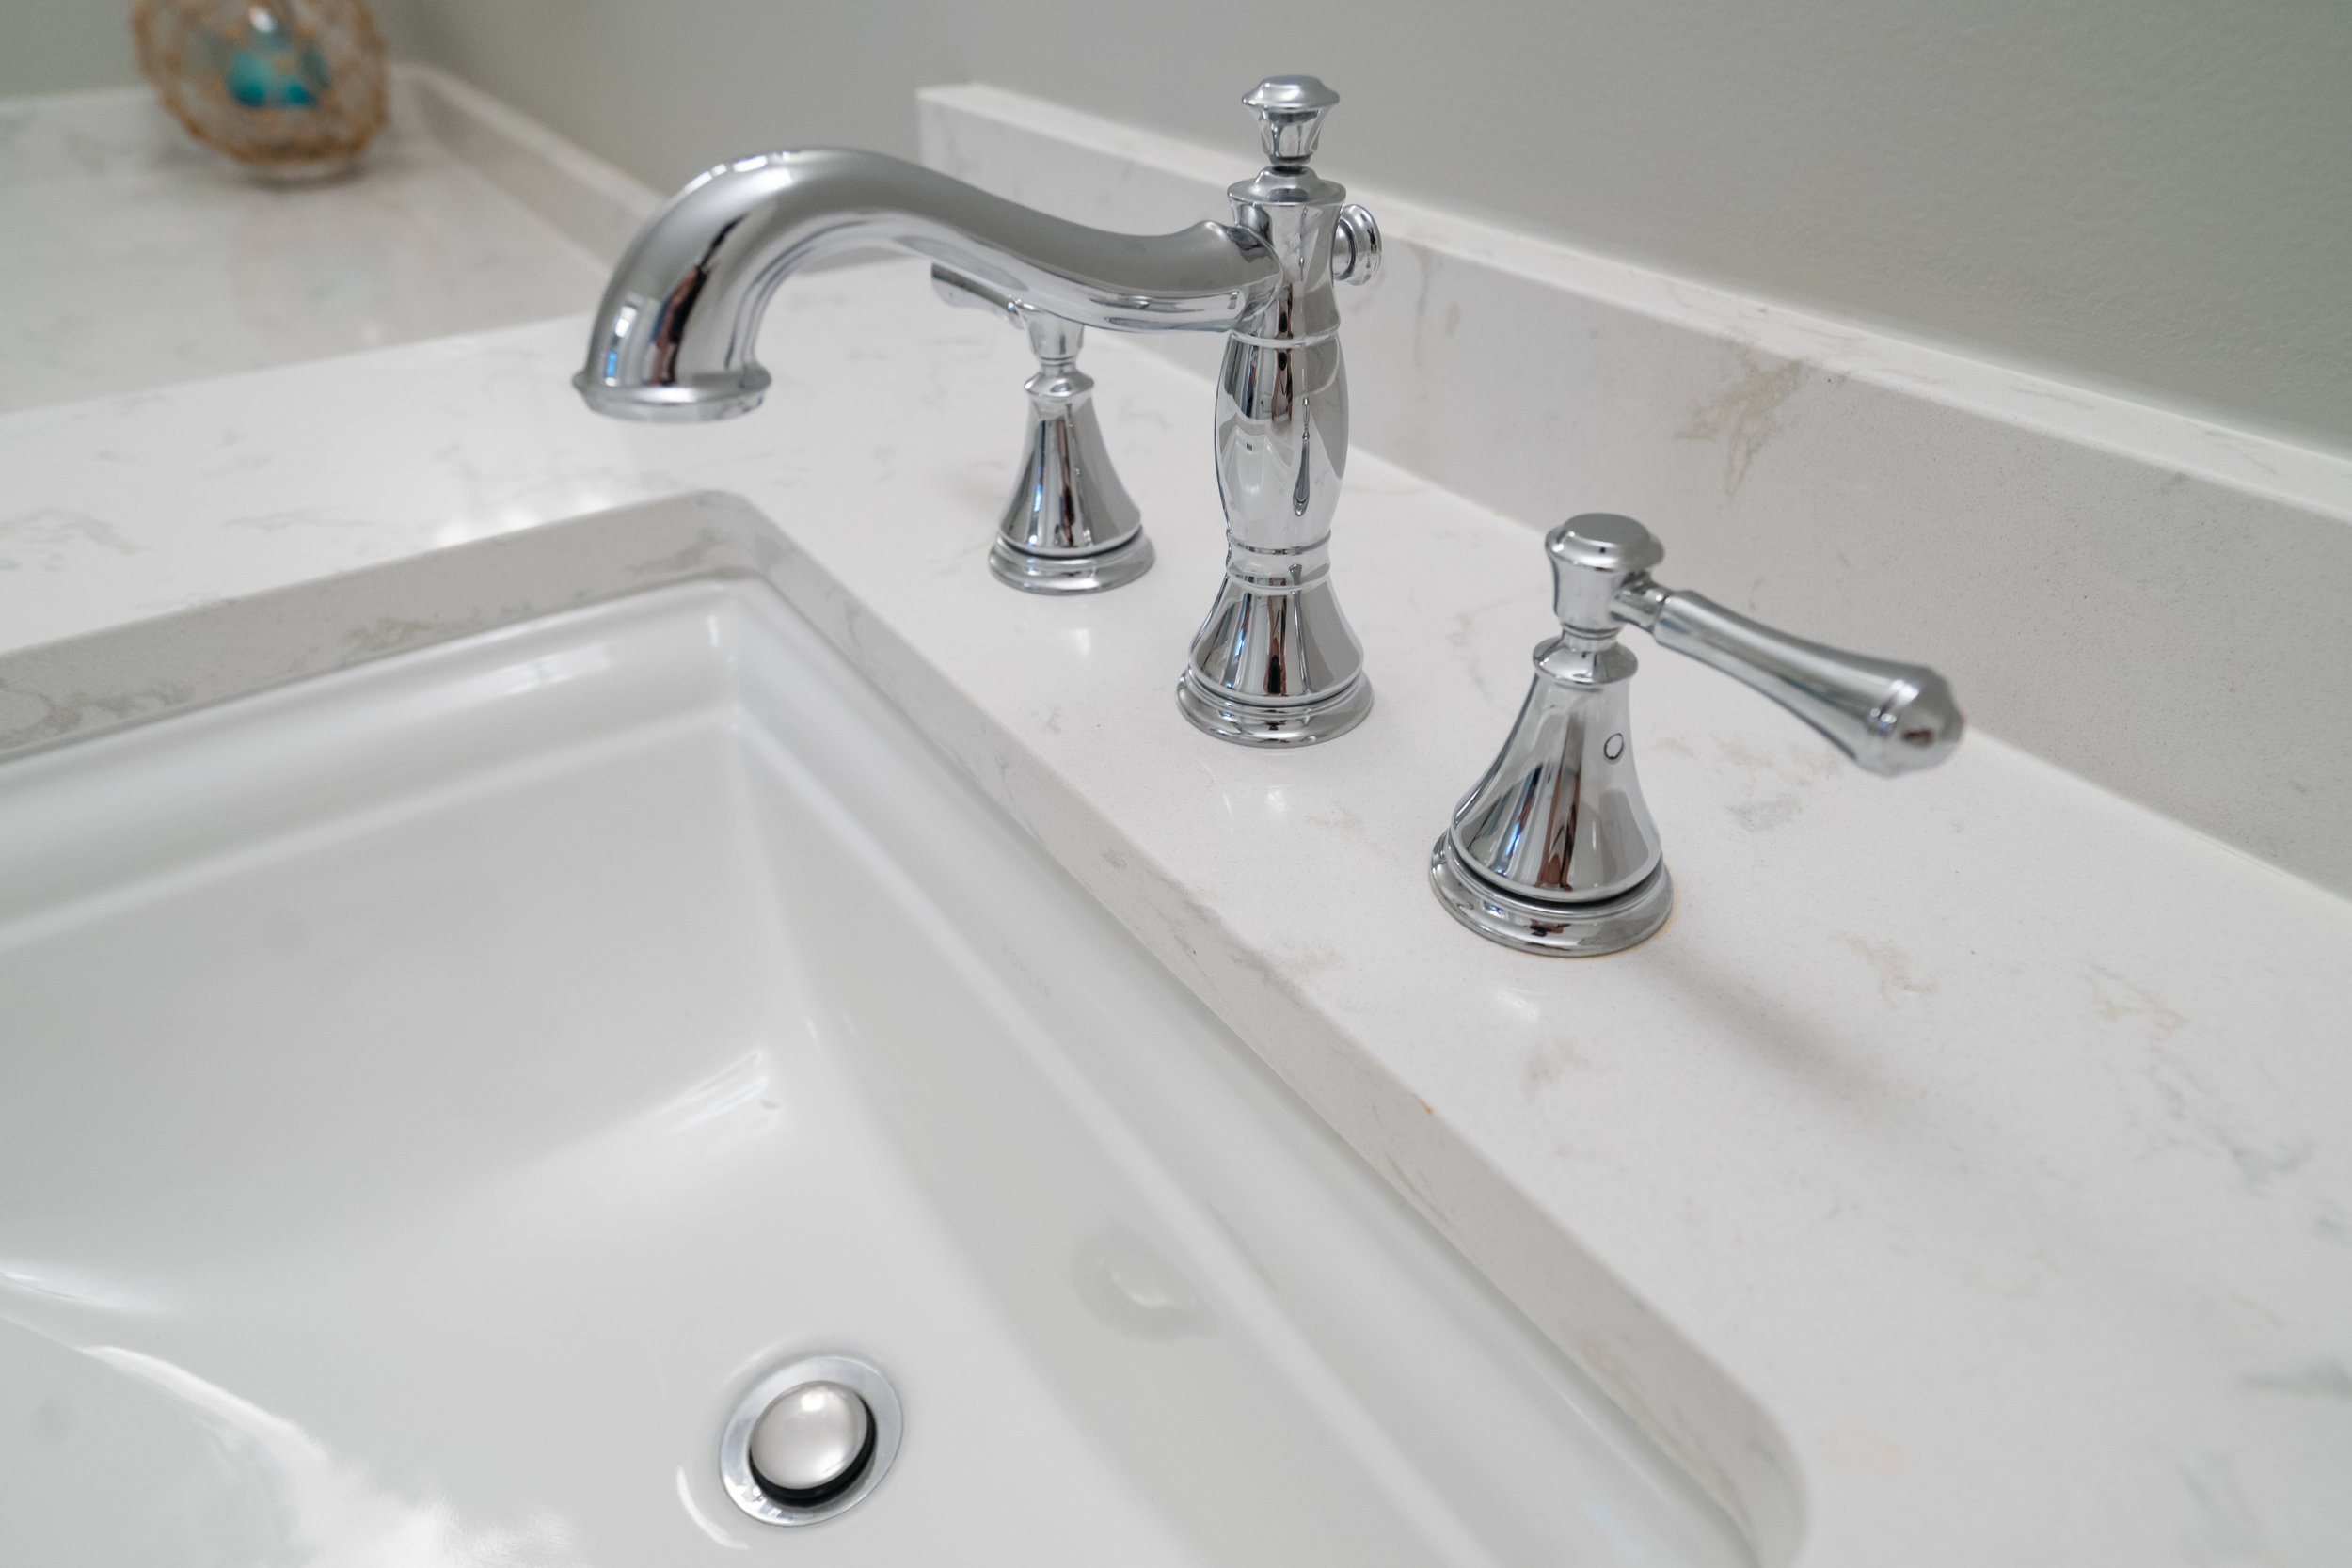 Polished Chrome faucet with Quartz countertops